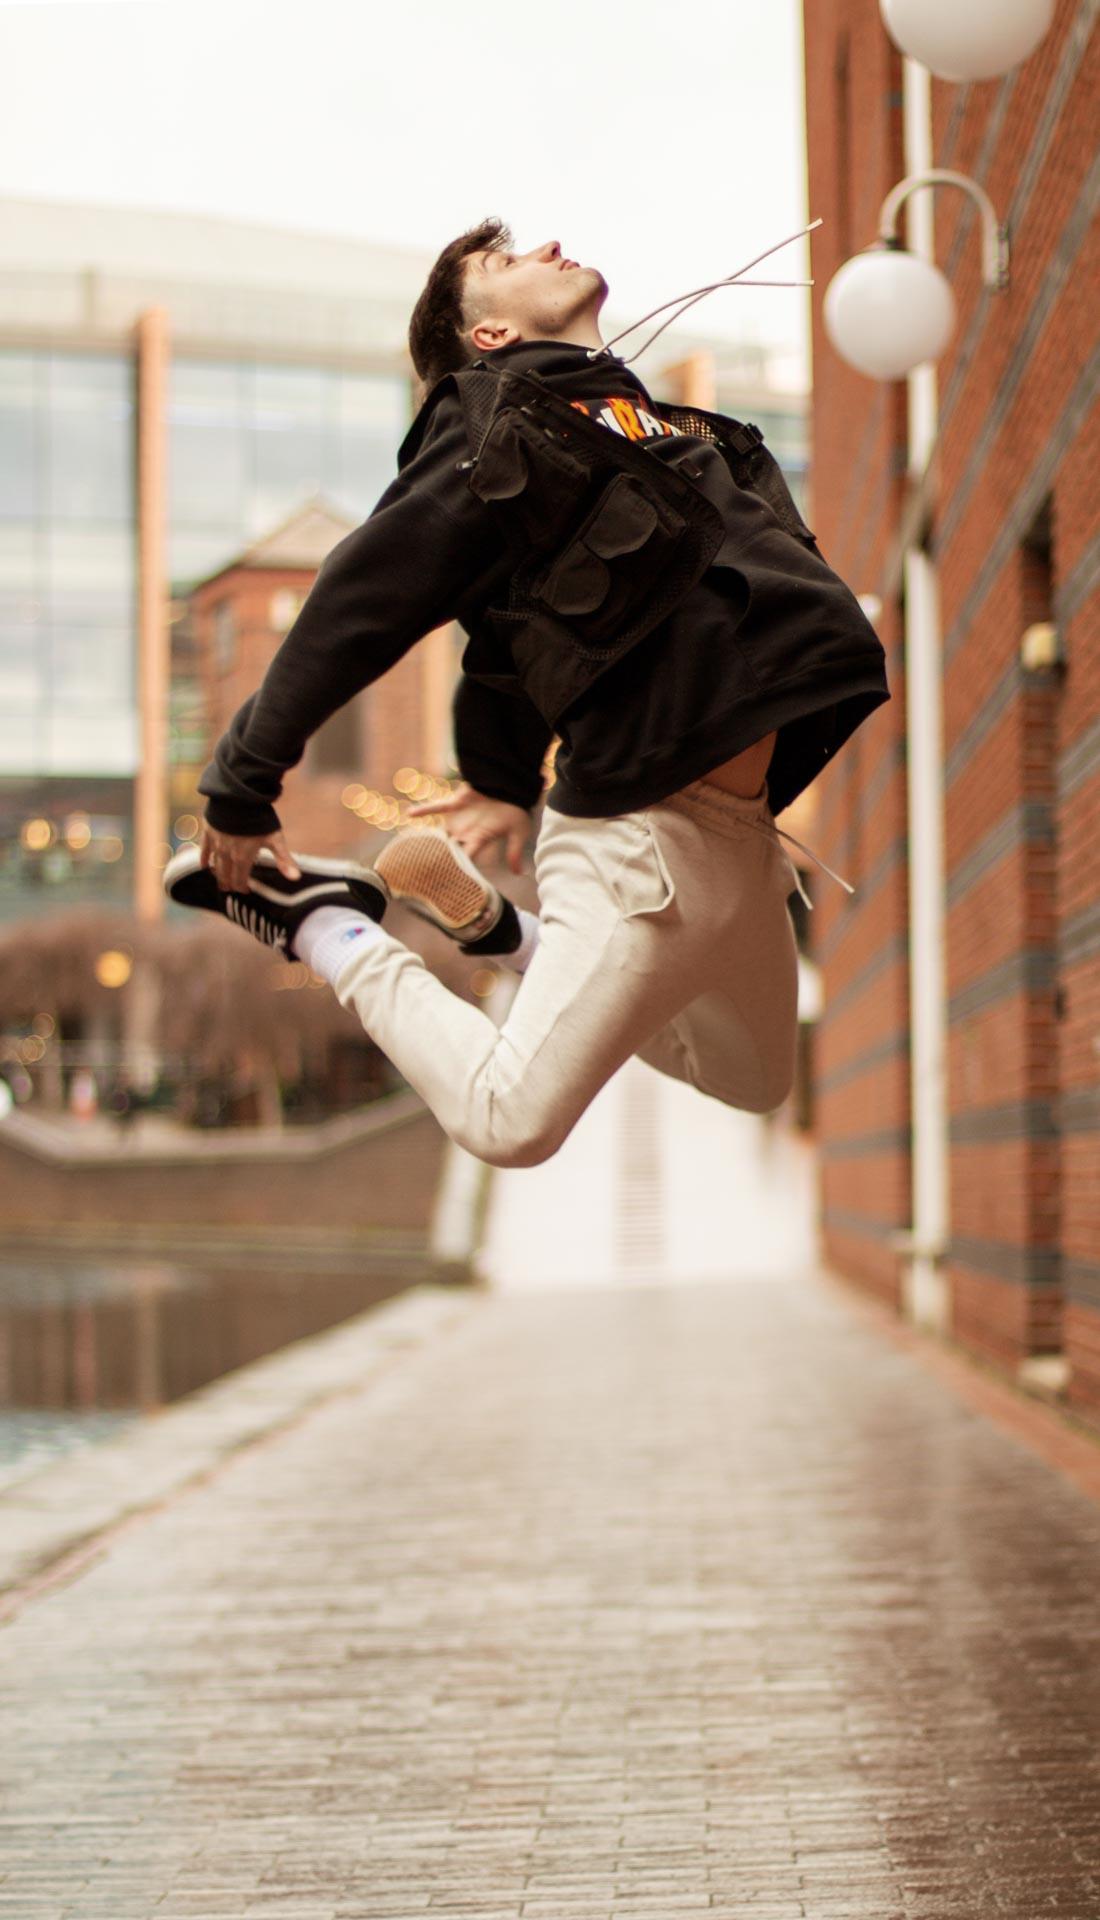 Dance photoshoot in Brindley place, Birmingham U.K.